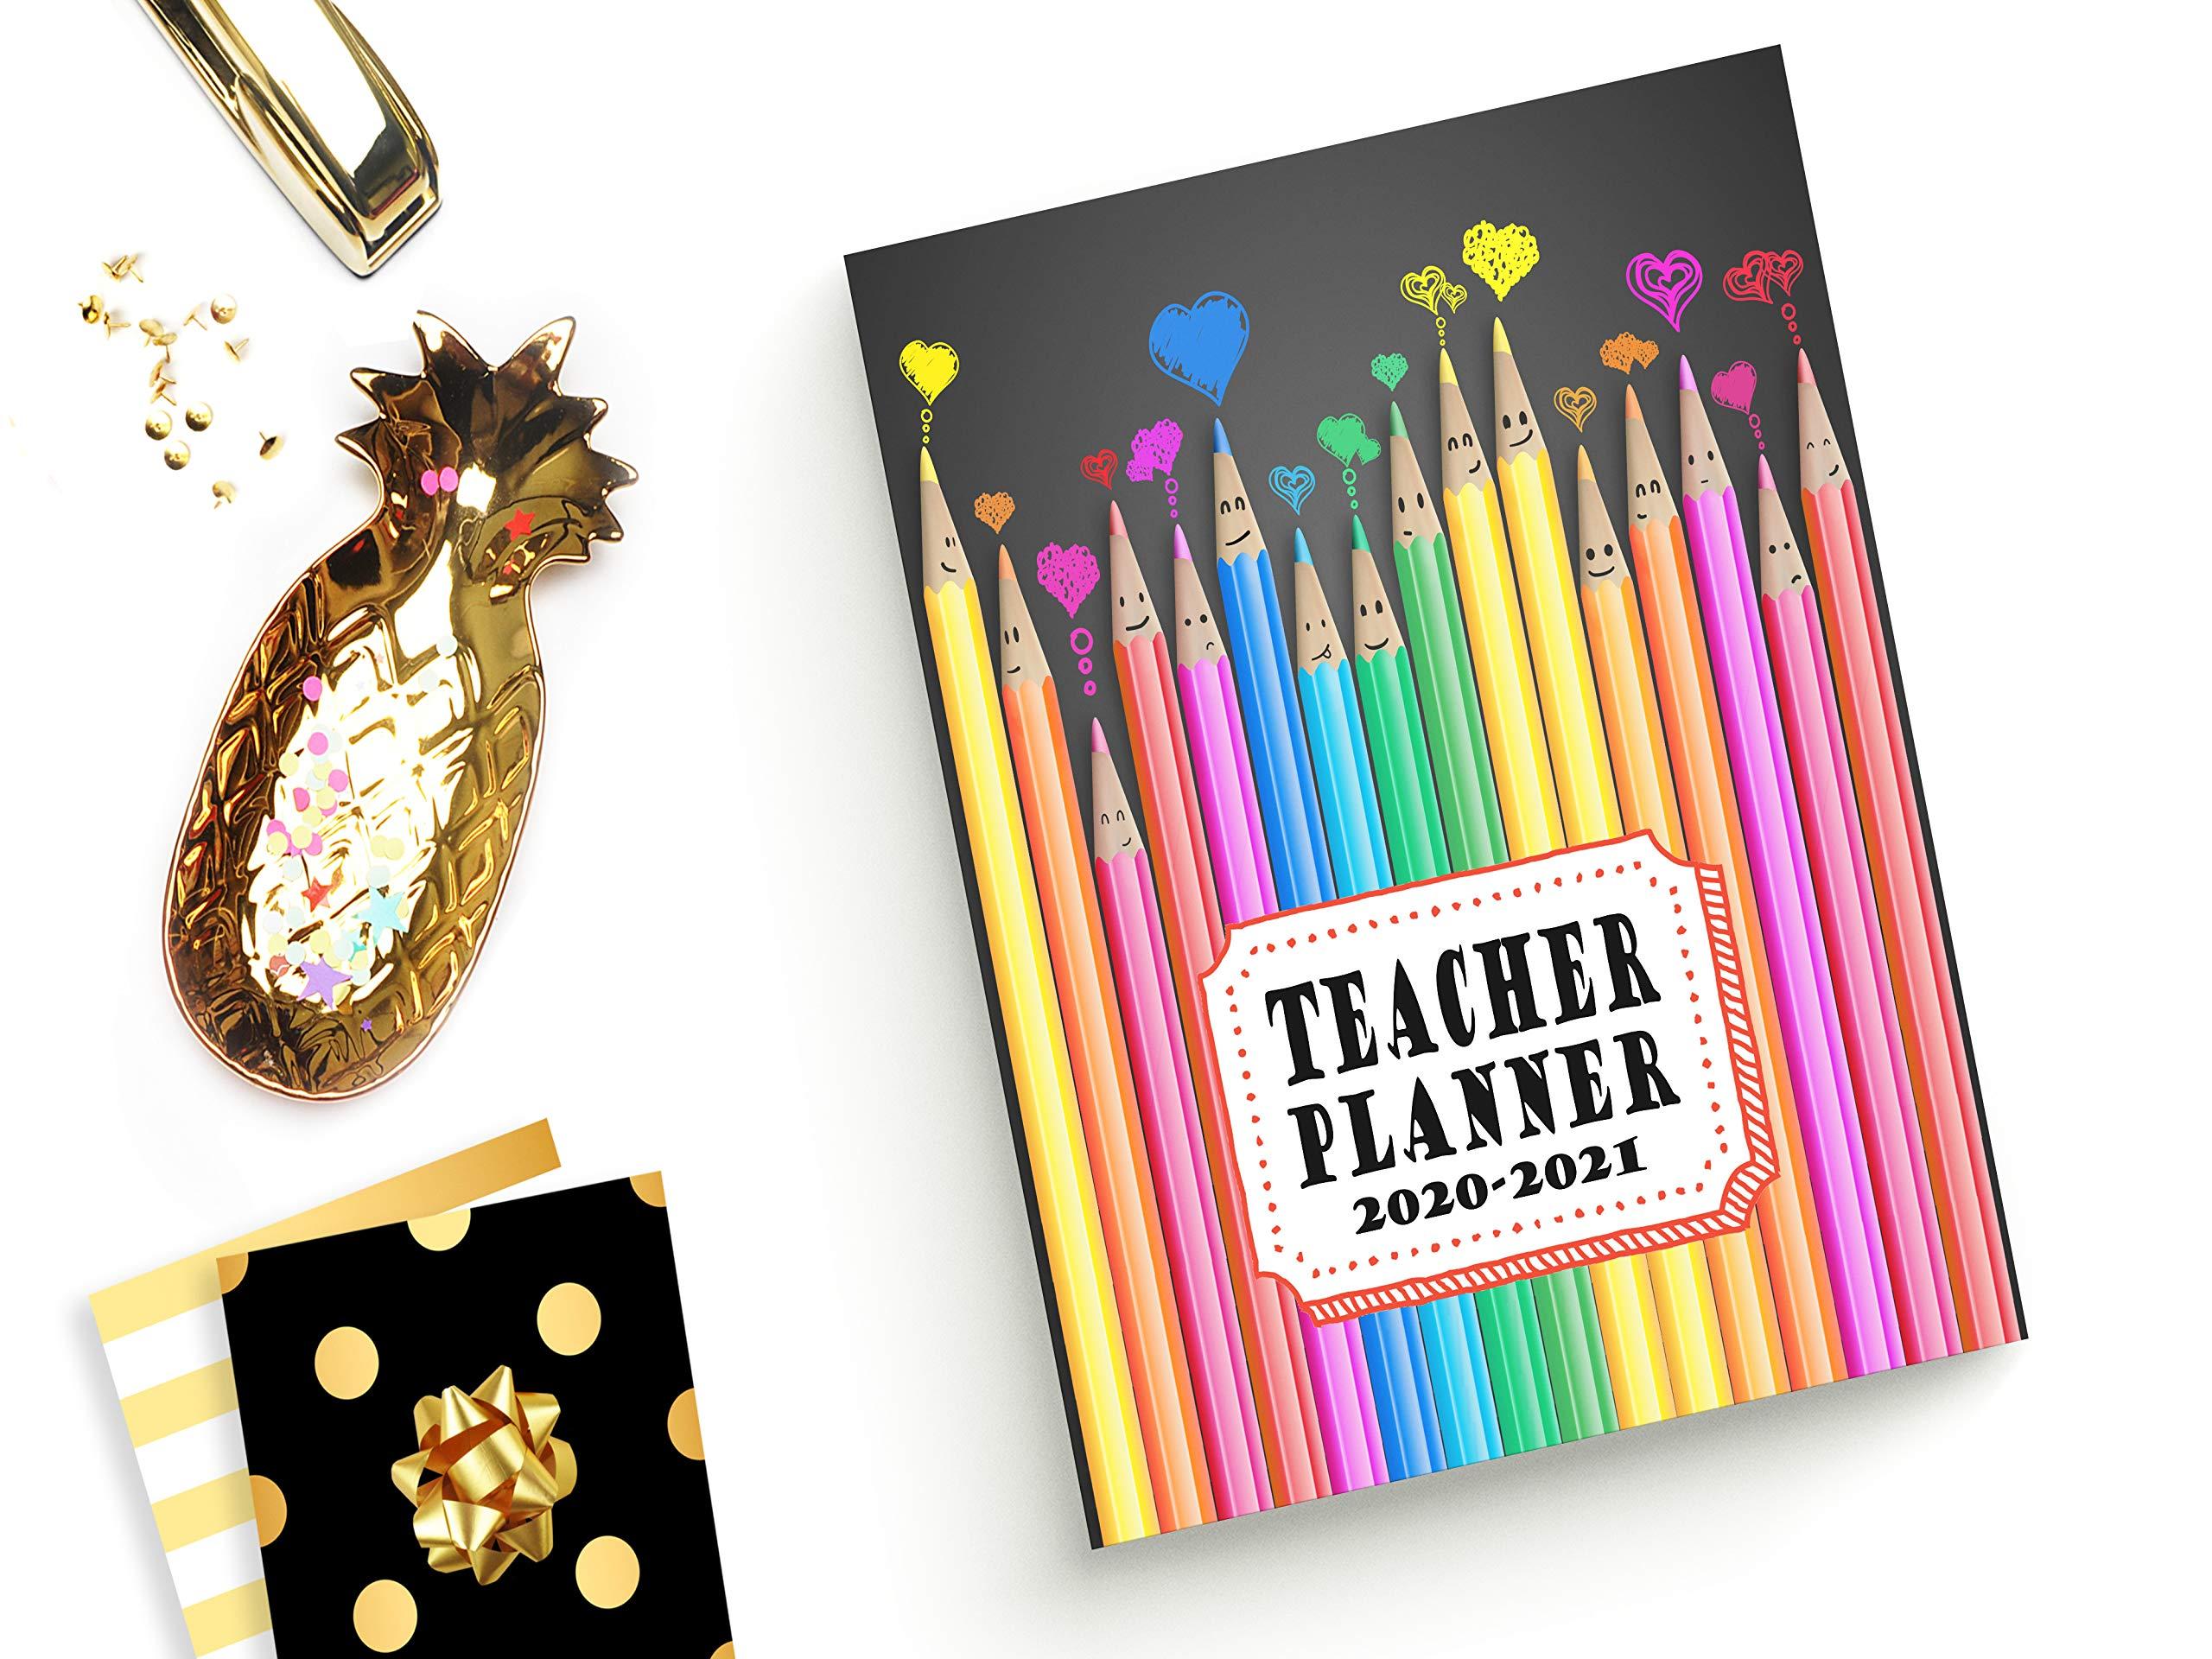 Teacher Planner: Vertical Academic Year Lesson Plan Calendar 8 Period Full Year Happy Colored Pencils (Lesson Plan Books For Teachers 2020-2021)